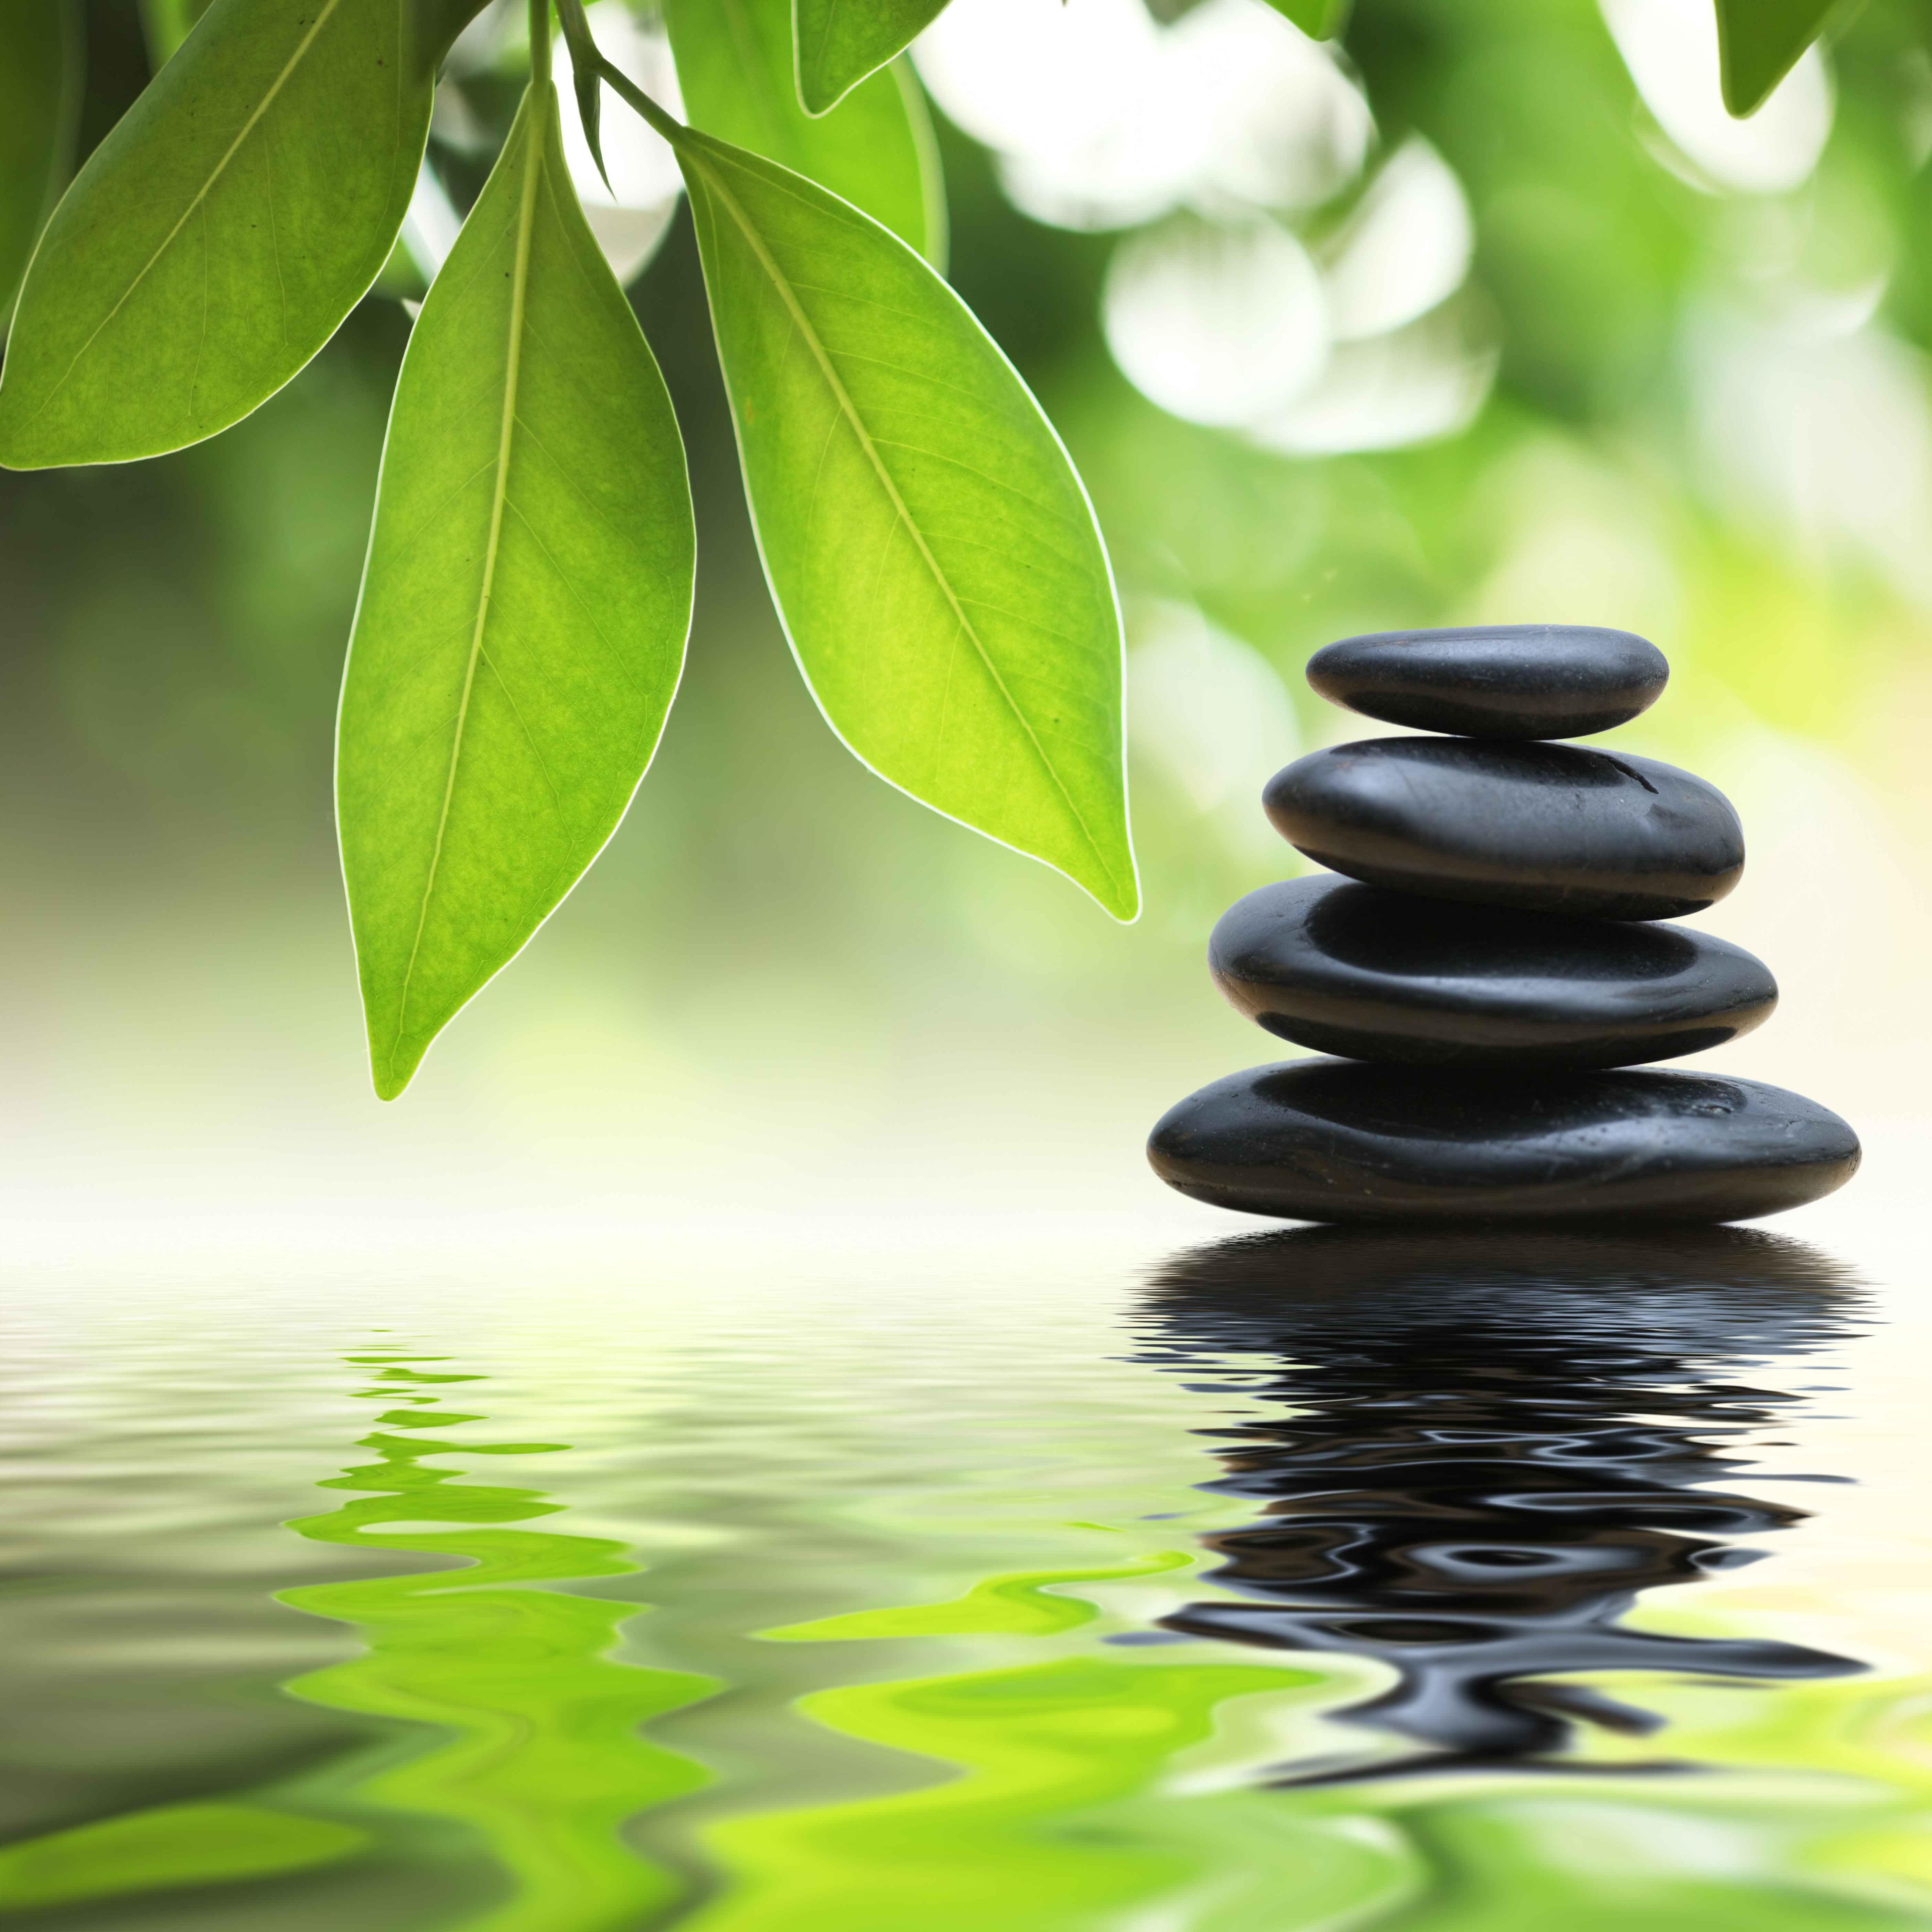 Zen stones pyramid on water surface